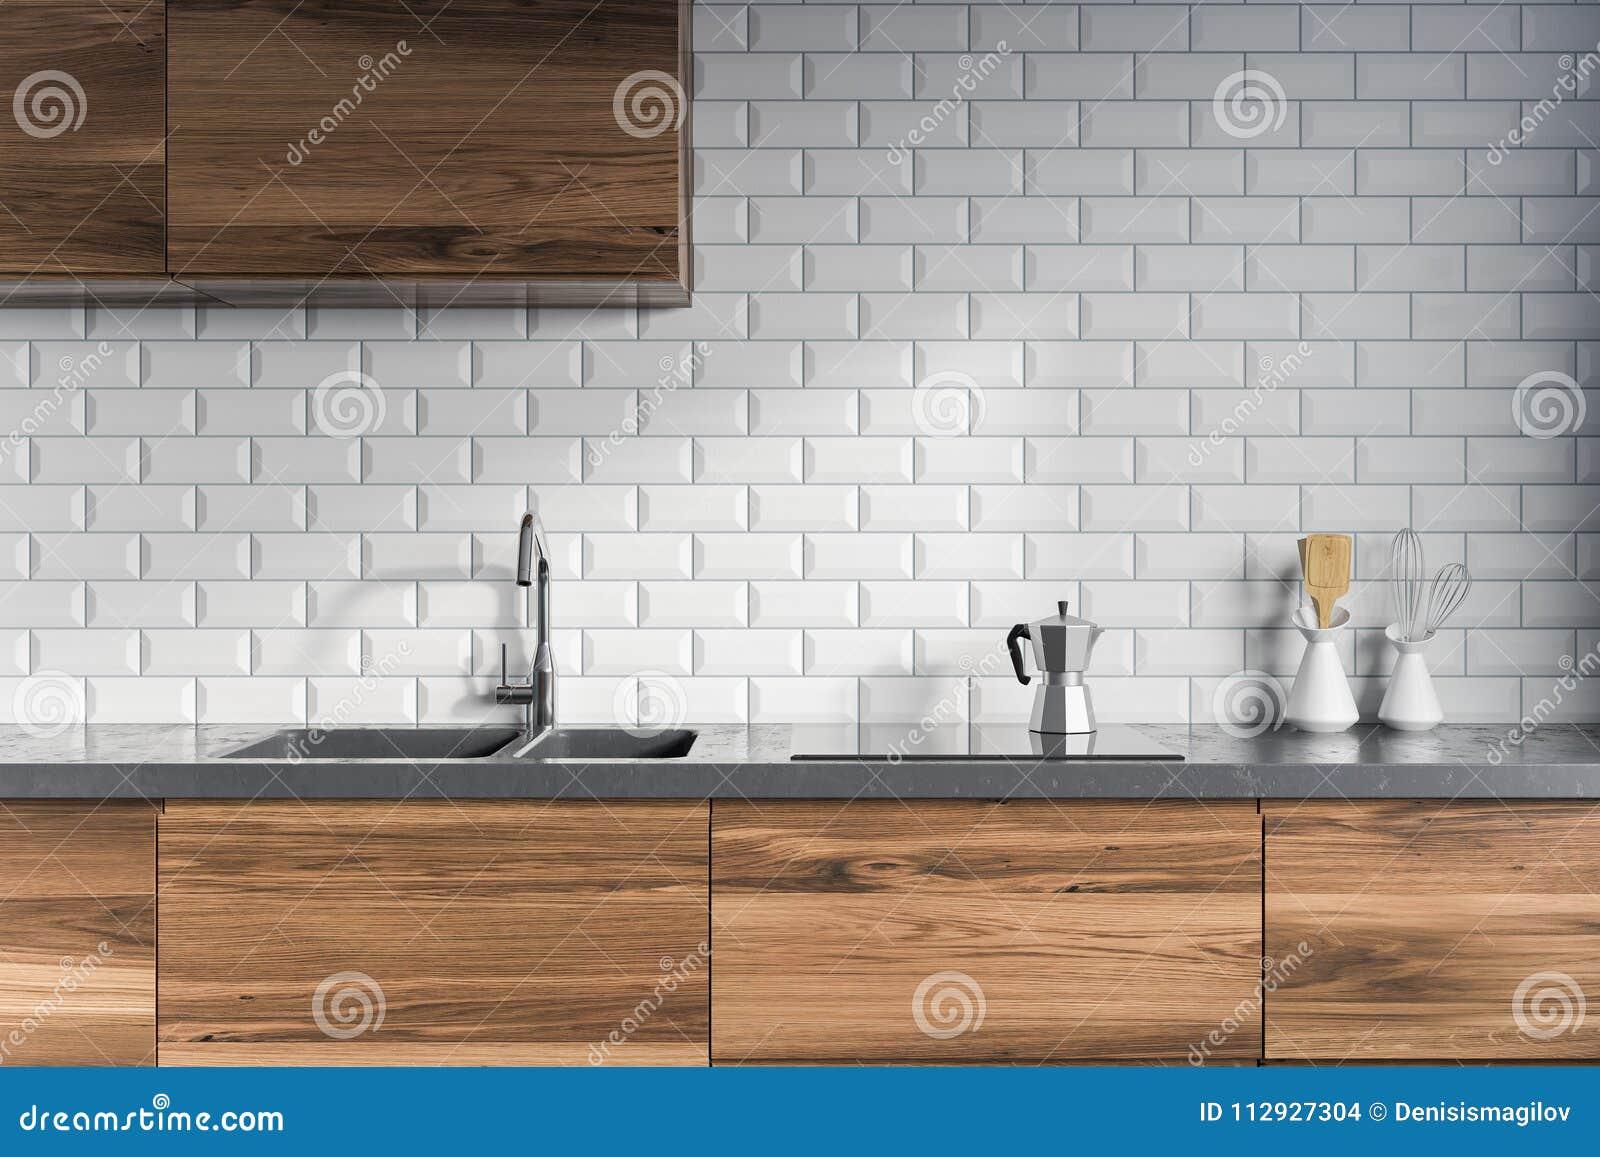 Tiled Kitchen Interior Dark Wooden Counters Stock Illustration Illustration Of Contemporary Decoration 112927304,Child Bedroom Furniture